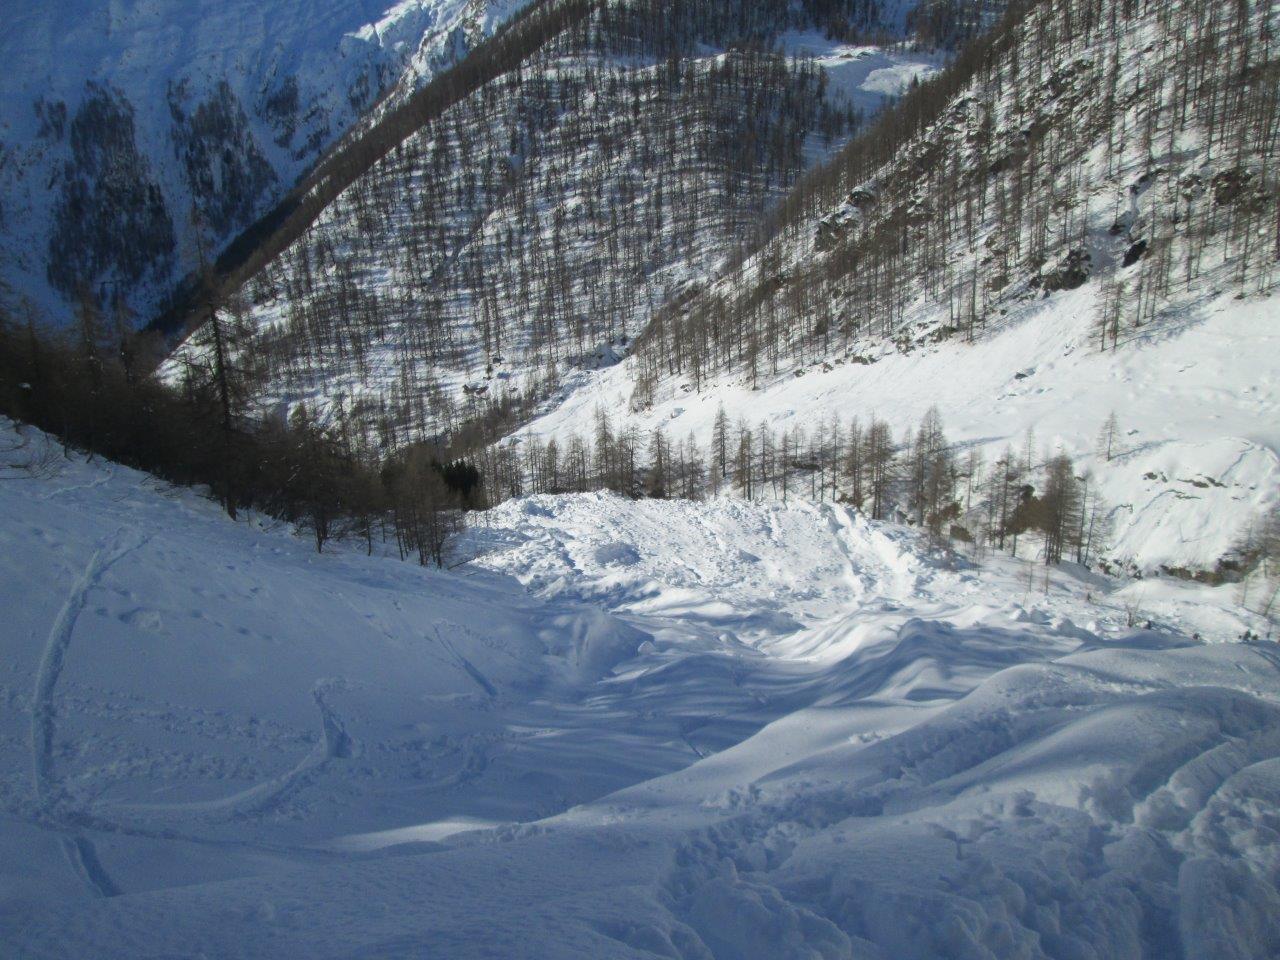 grossa valanga ricoperta dalla neve di venerdì